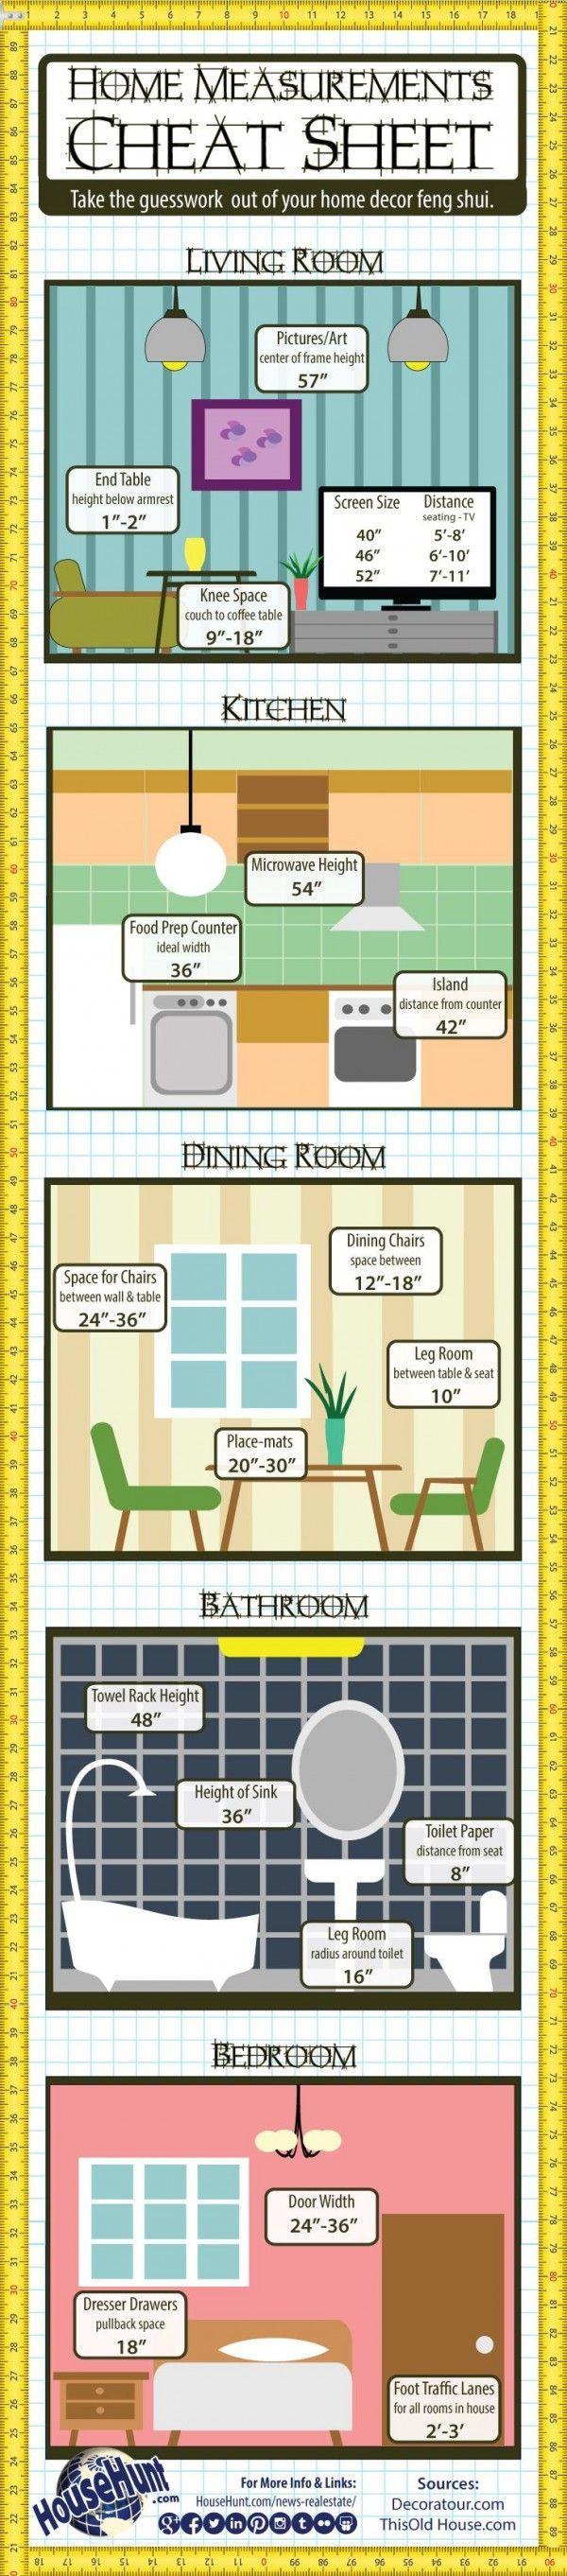 Home measurement cheat sheet Source: www.househunt.com